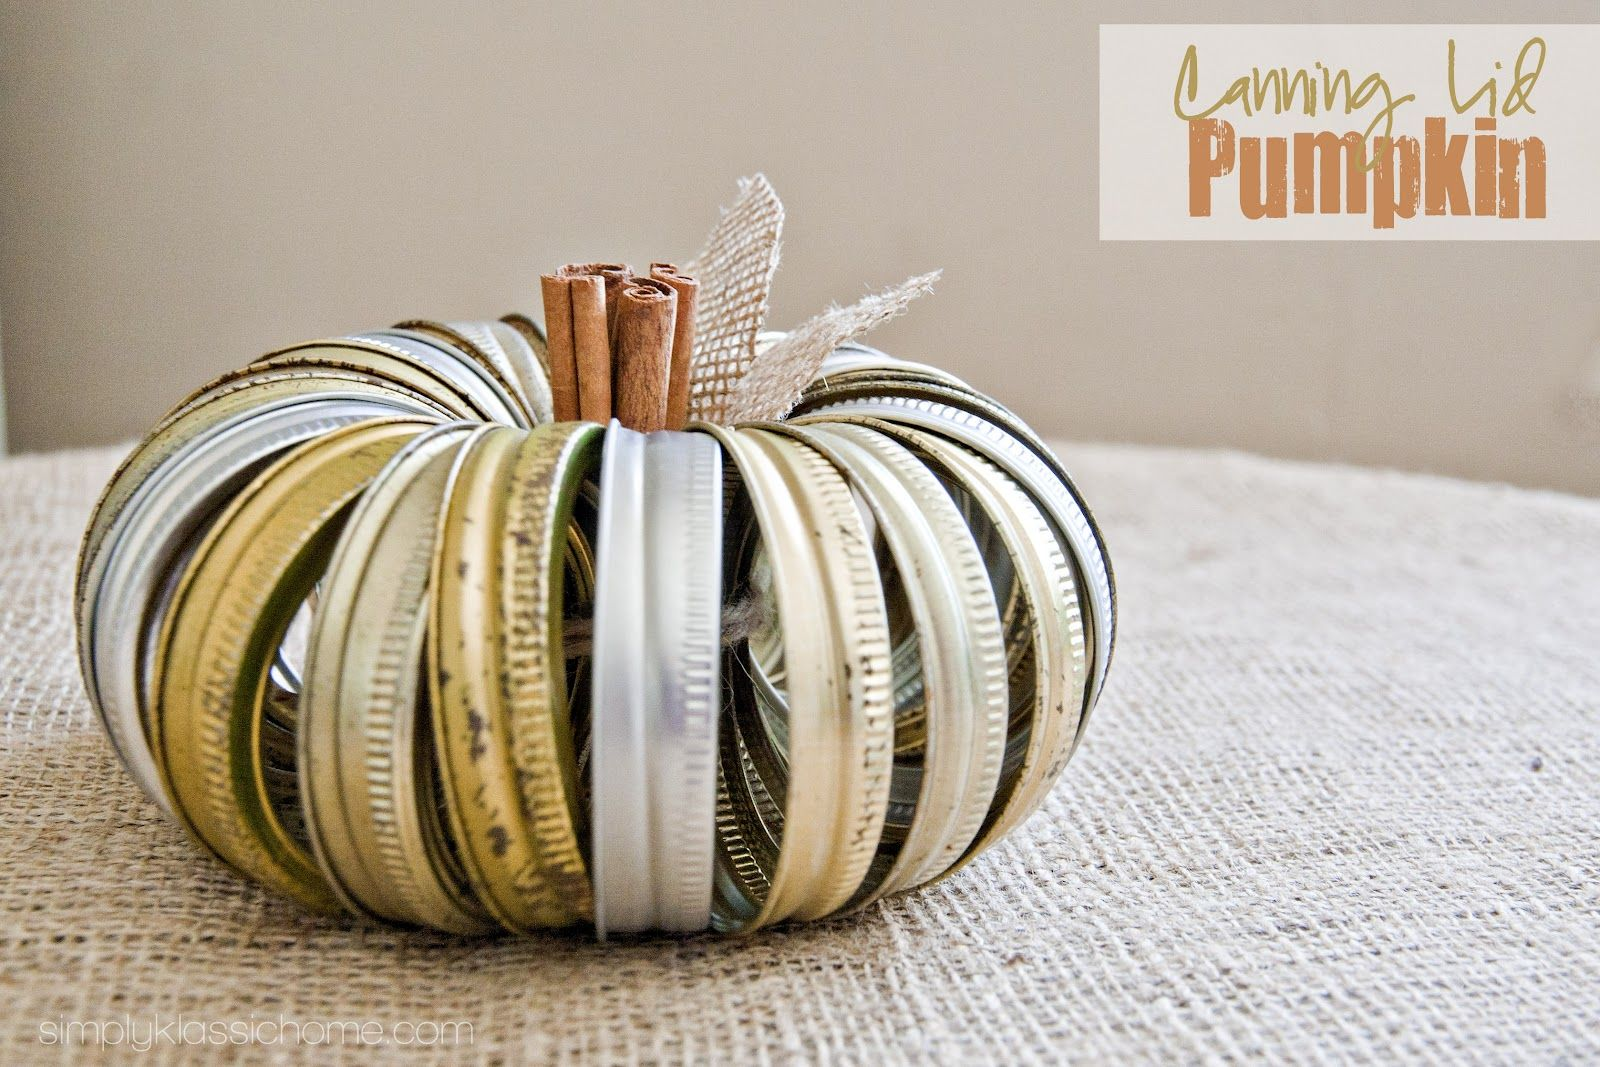 Simply Klassic Home: Canning Jar Lid Pumpkin